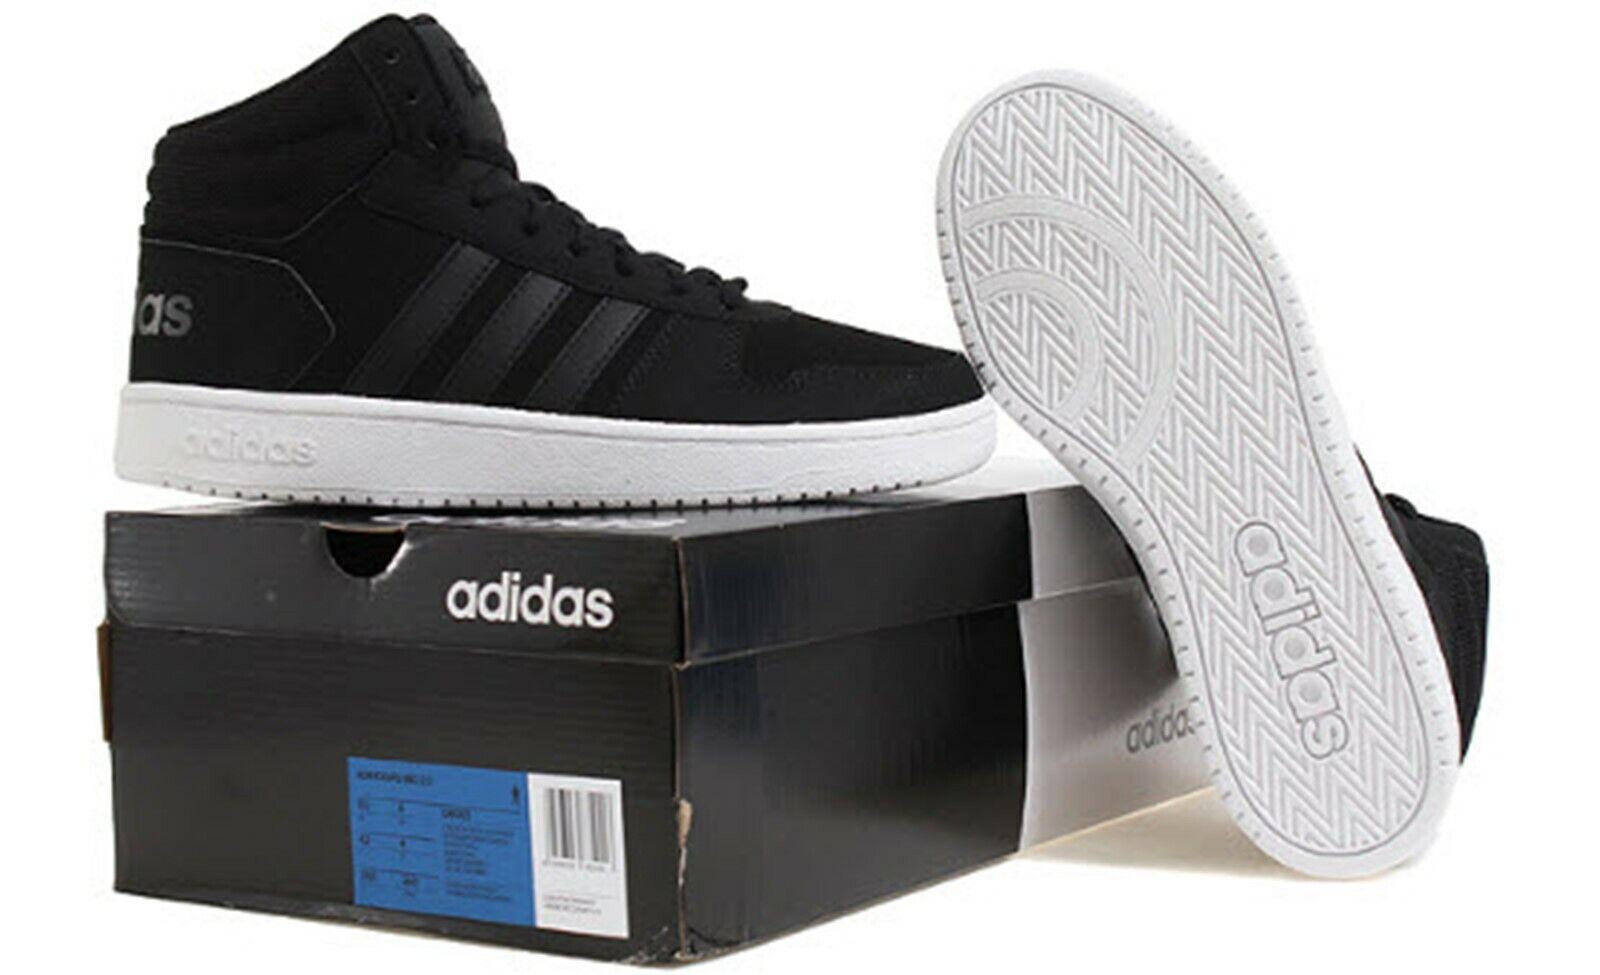 Verkauf Online Rabatt Adidas Men ADIHOOPS MID 2.0 Schuhe